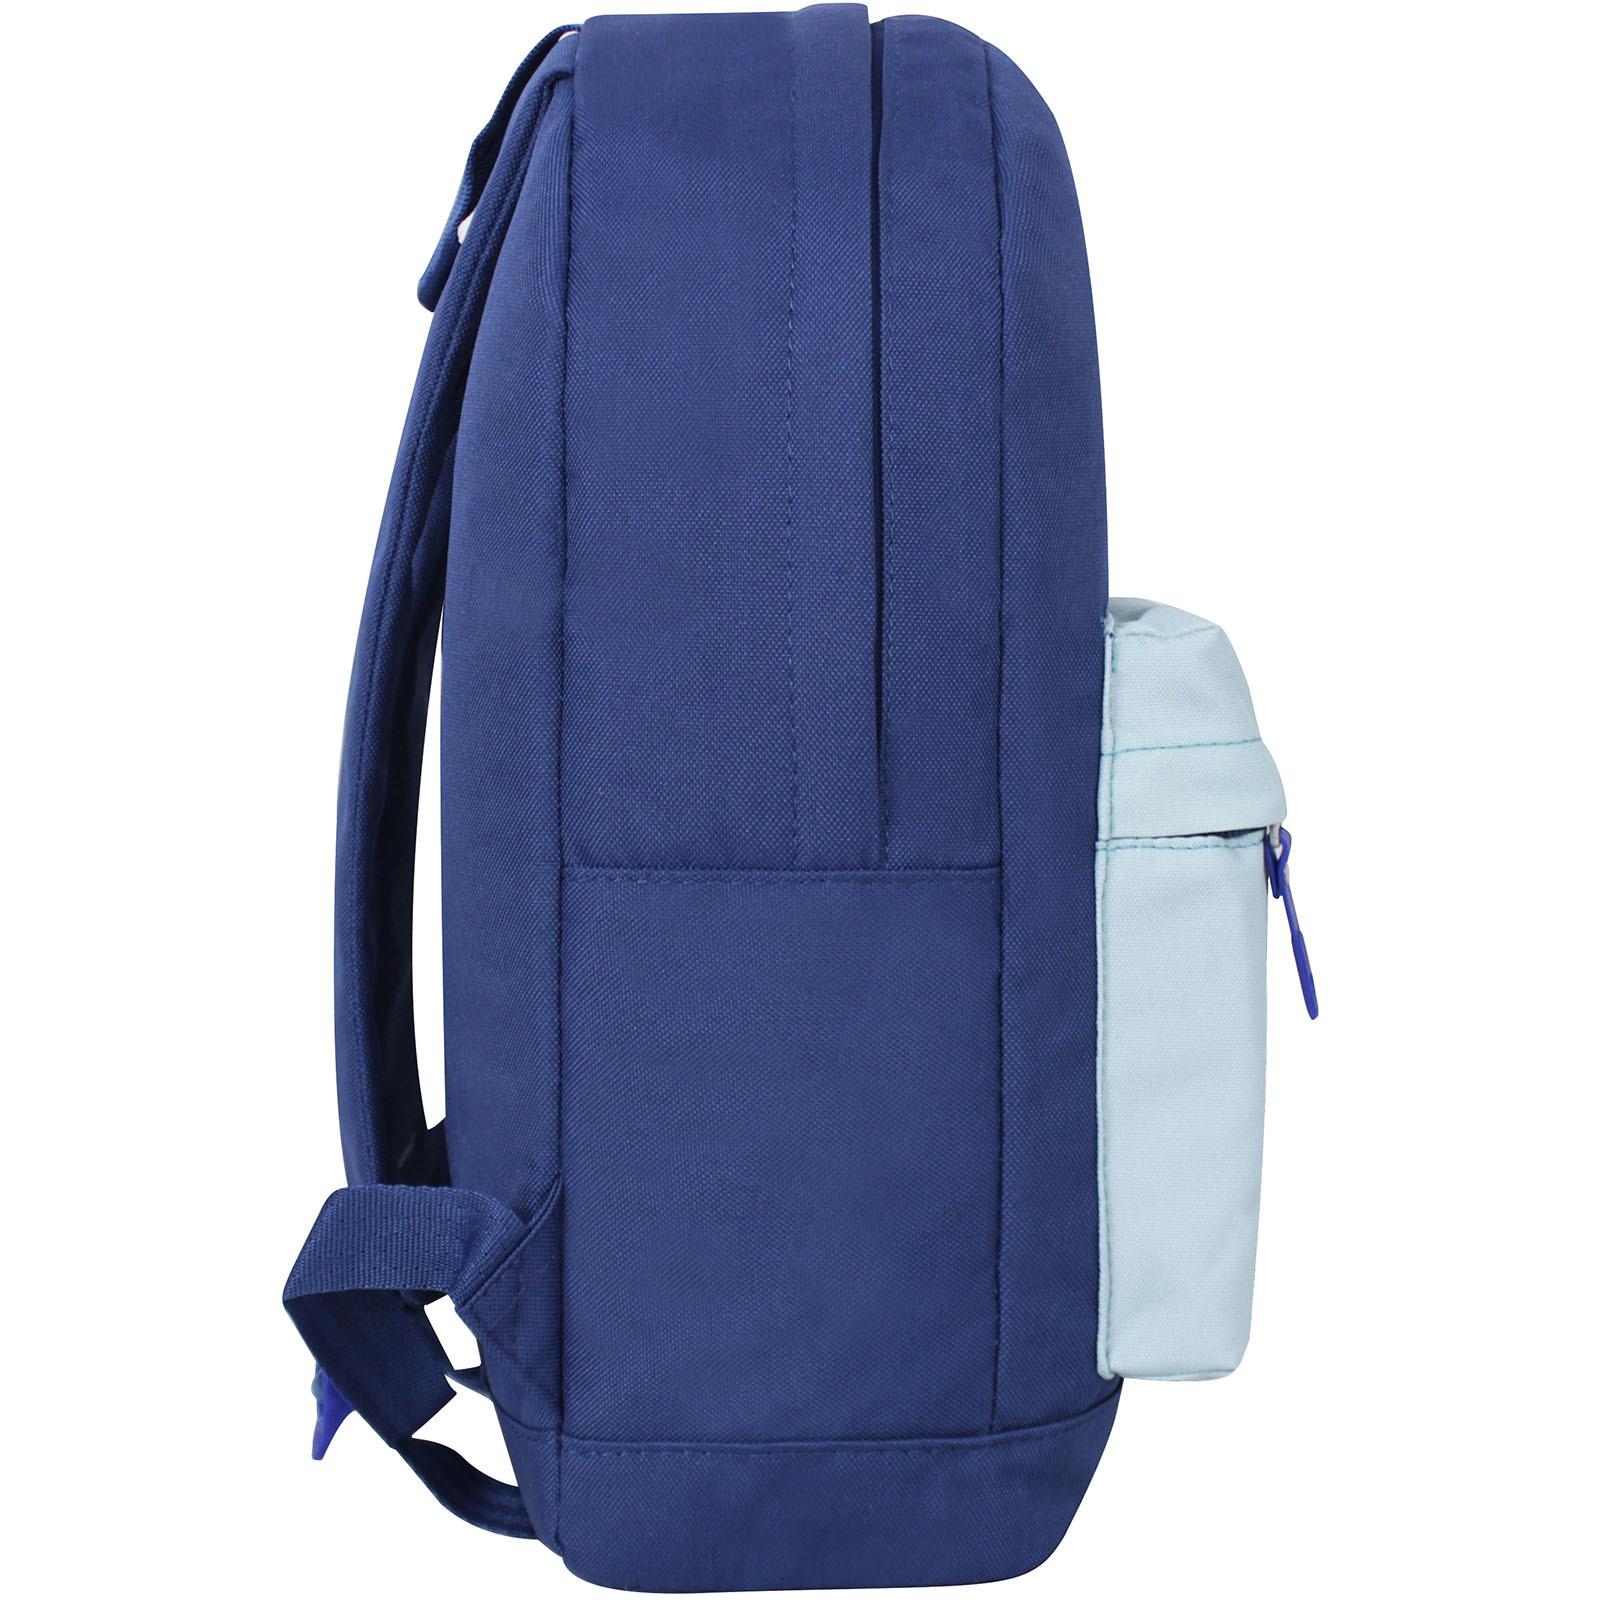 Рюкзак Bagland Молодежный W/R 17 л. Синий 181 (00533662) фото 2